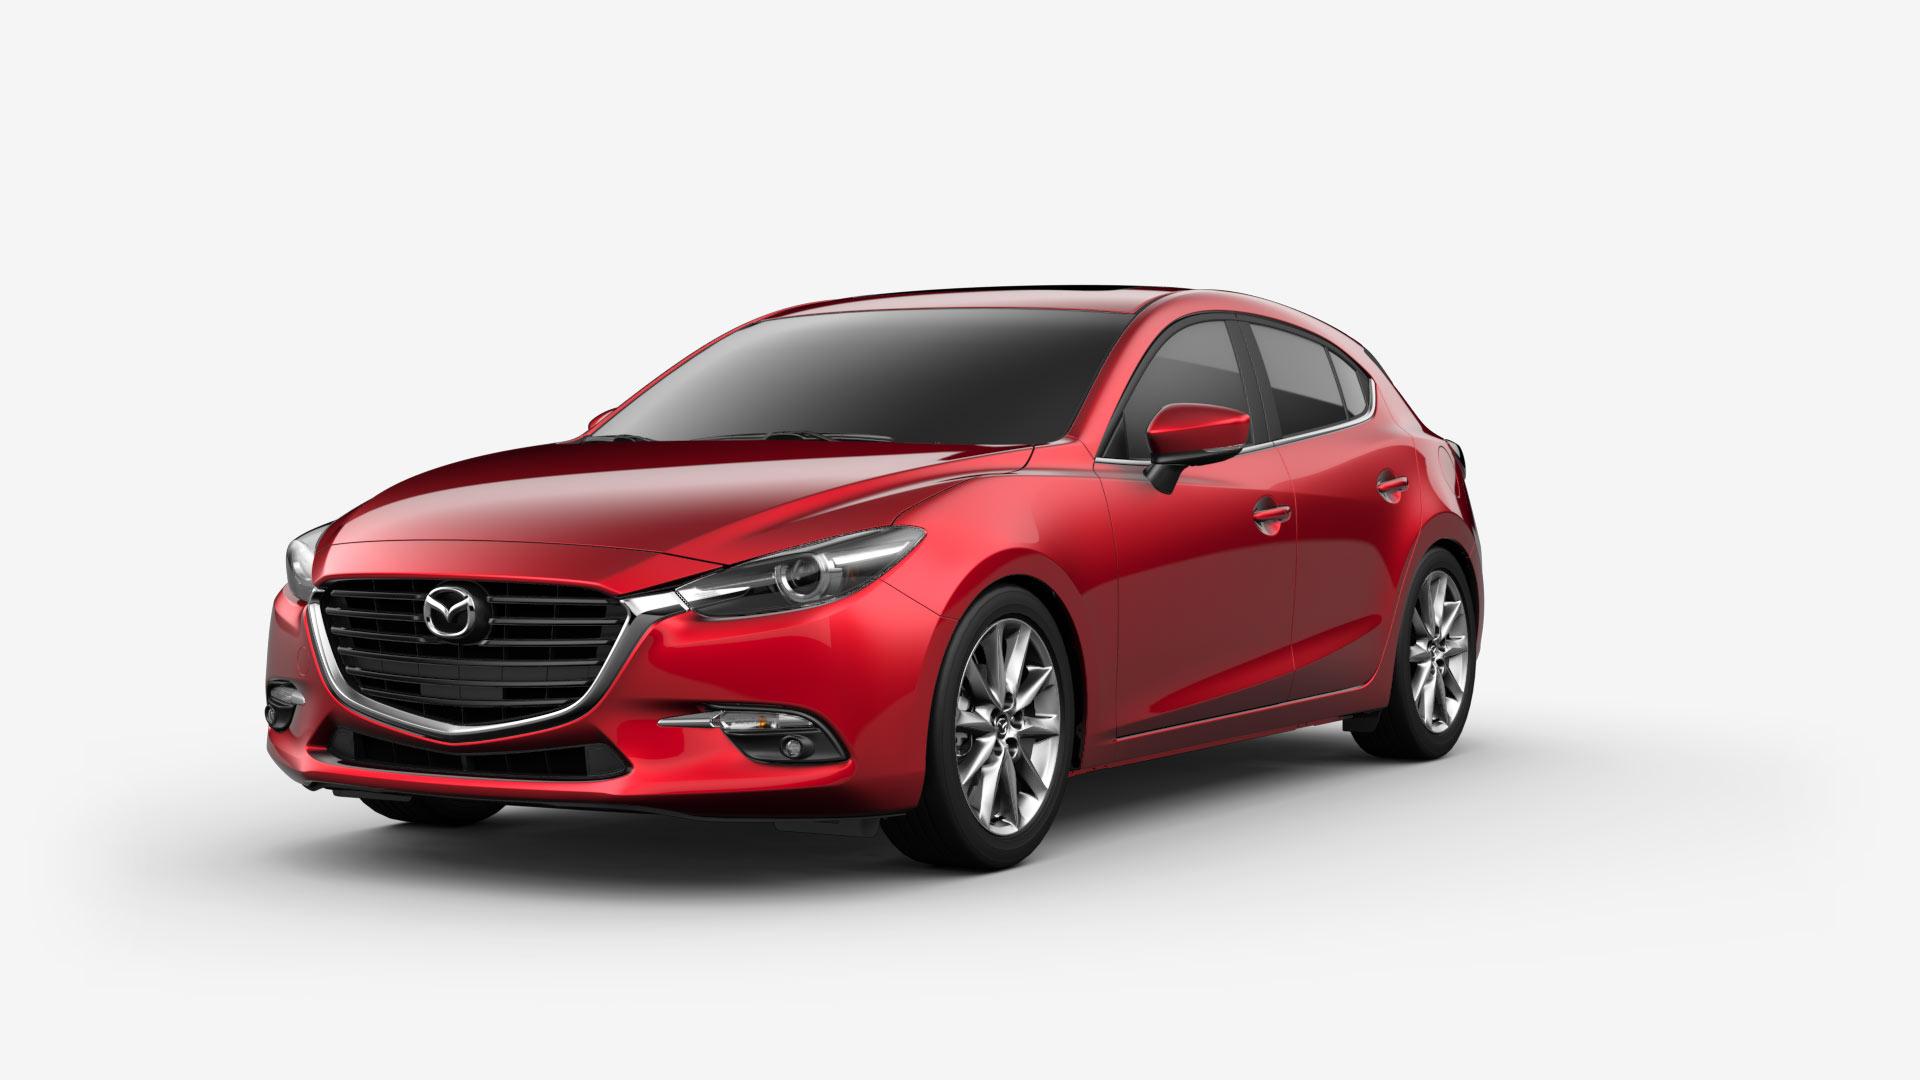 2018 Mazda 3 Hatchback Fuel Efficient Compact Car Mazda Usa